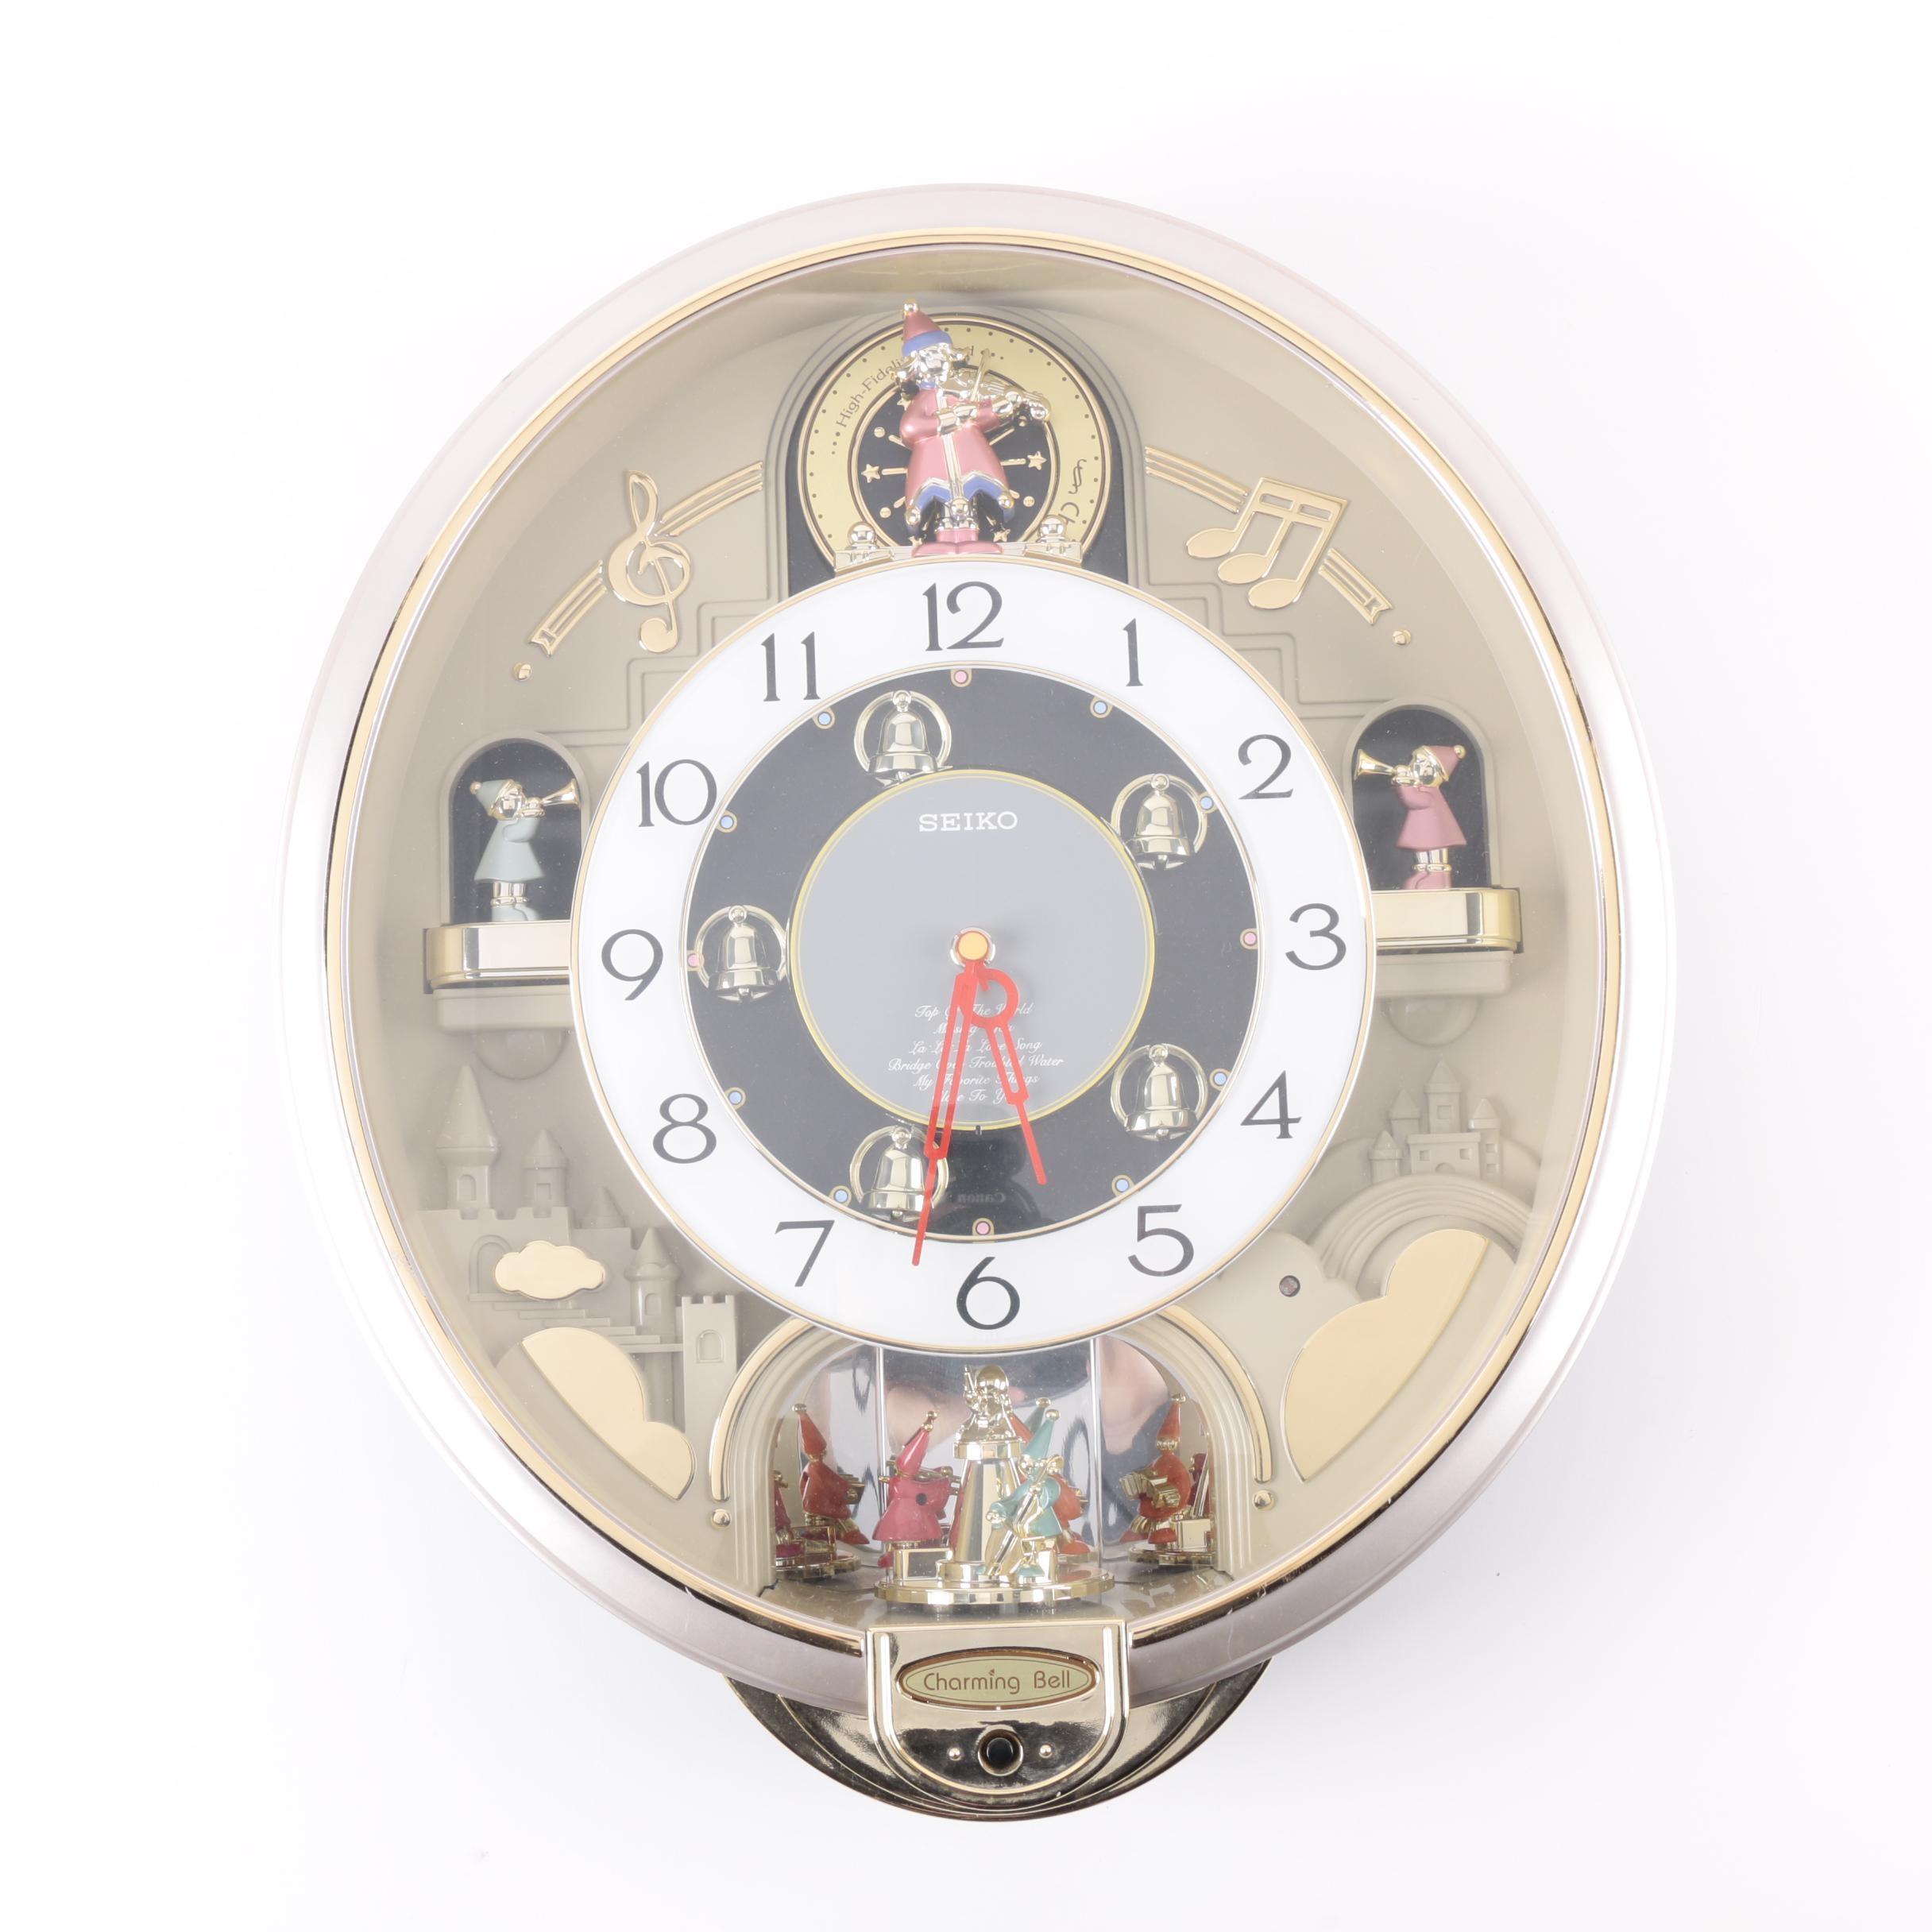 Vintage Seiko Charming Bell Wall Clock